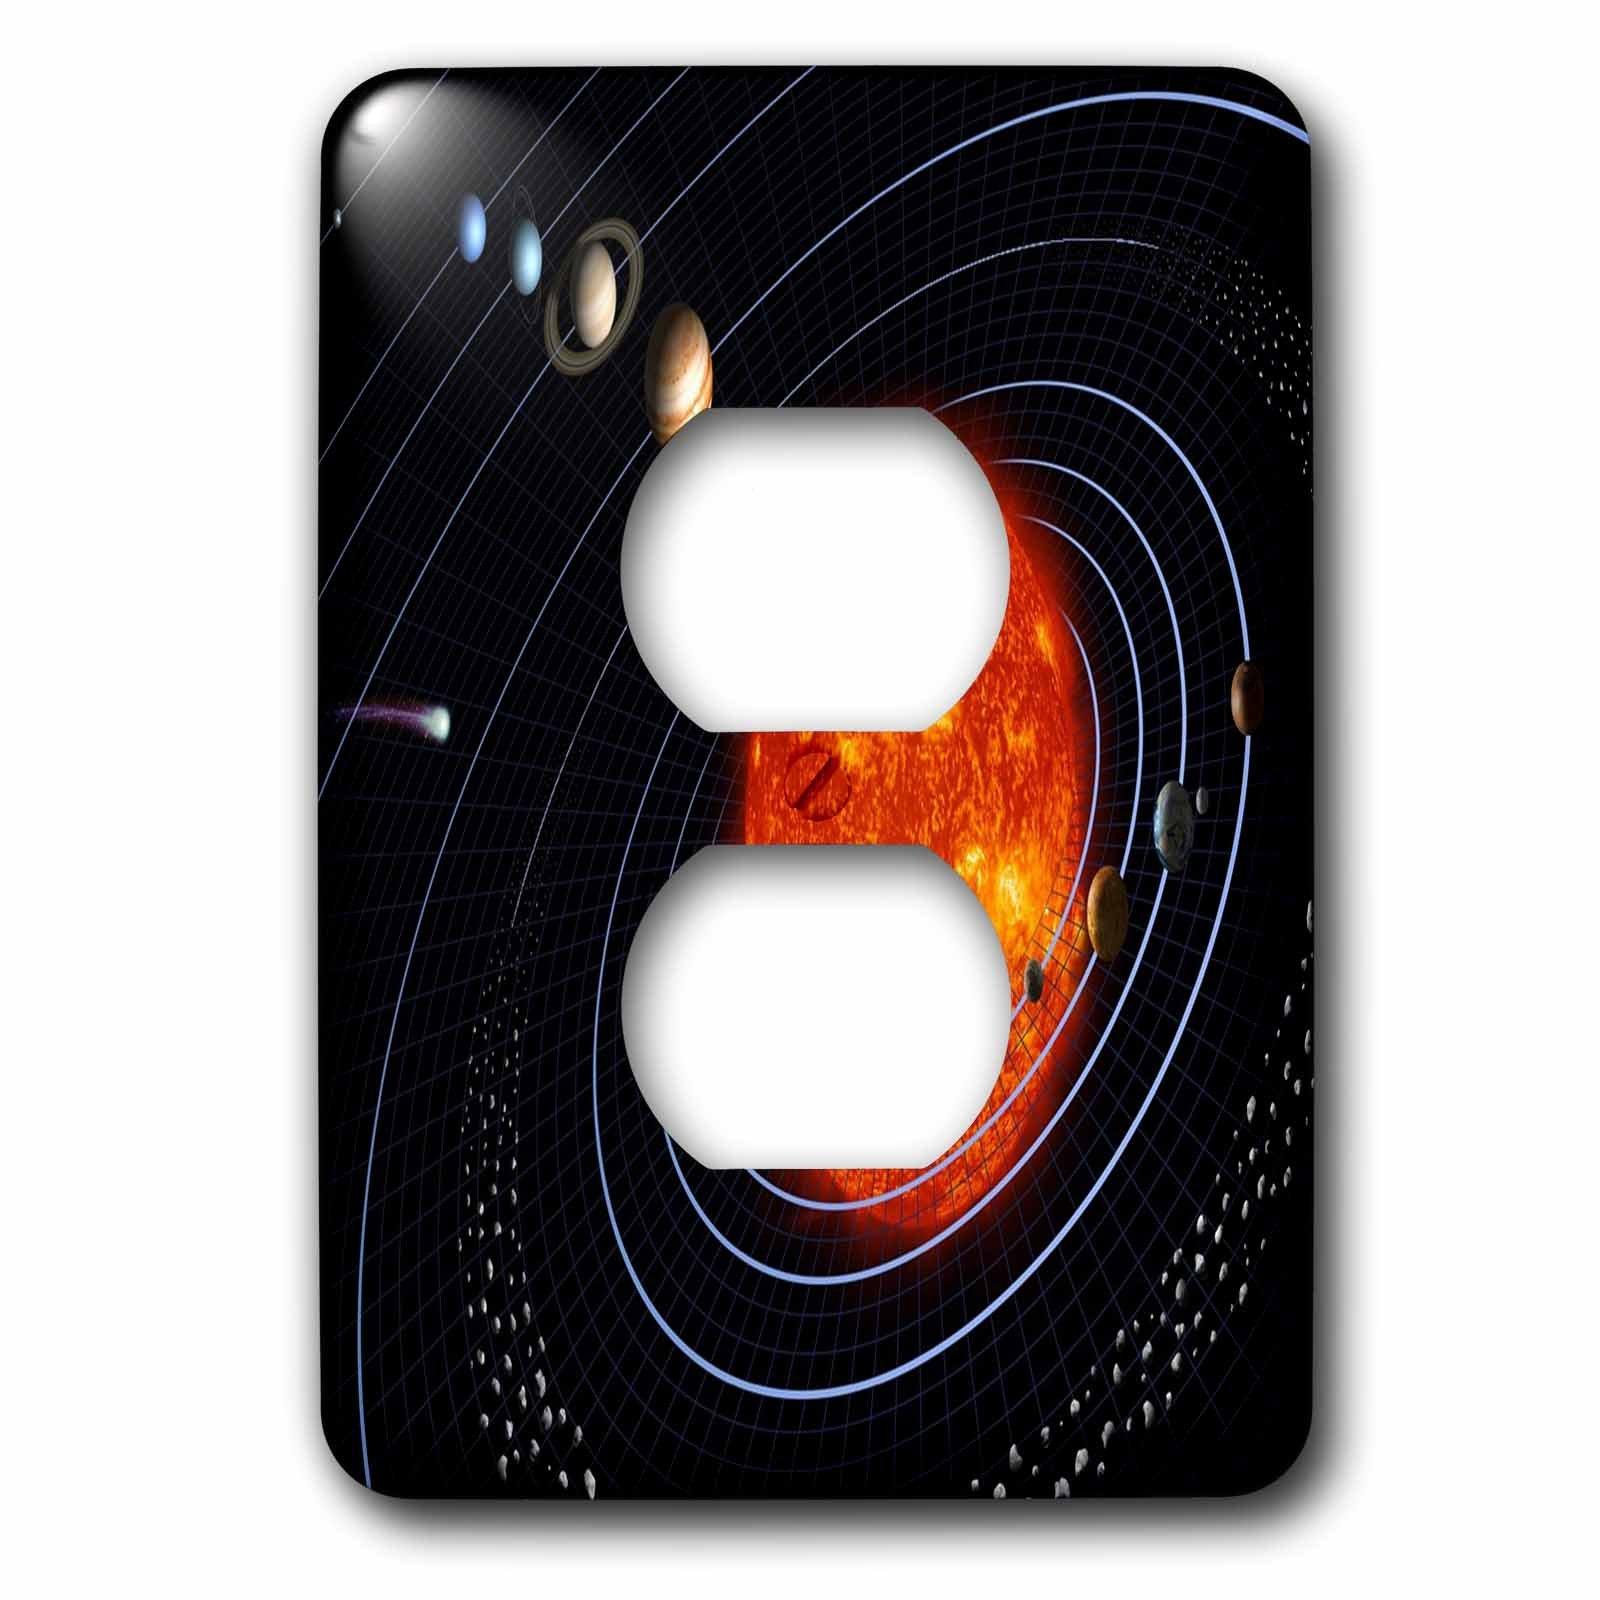 3dRose LLC lsp_80606_6 Nasa Diagram of Planet N Solar System 2 Plug Outlet Cover